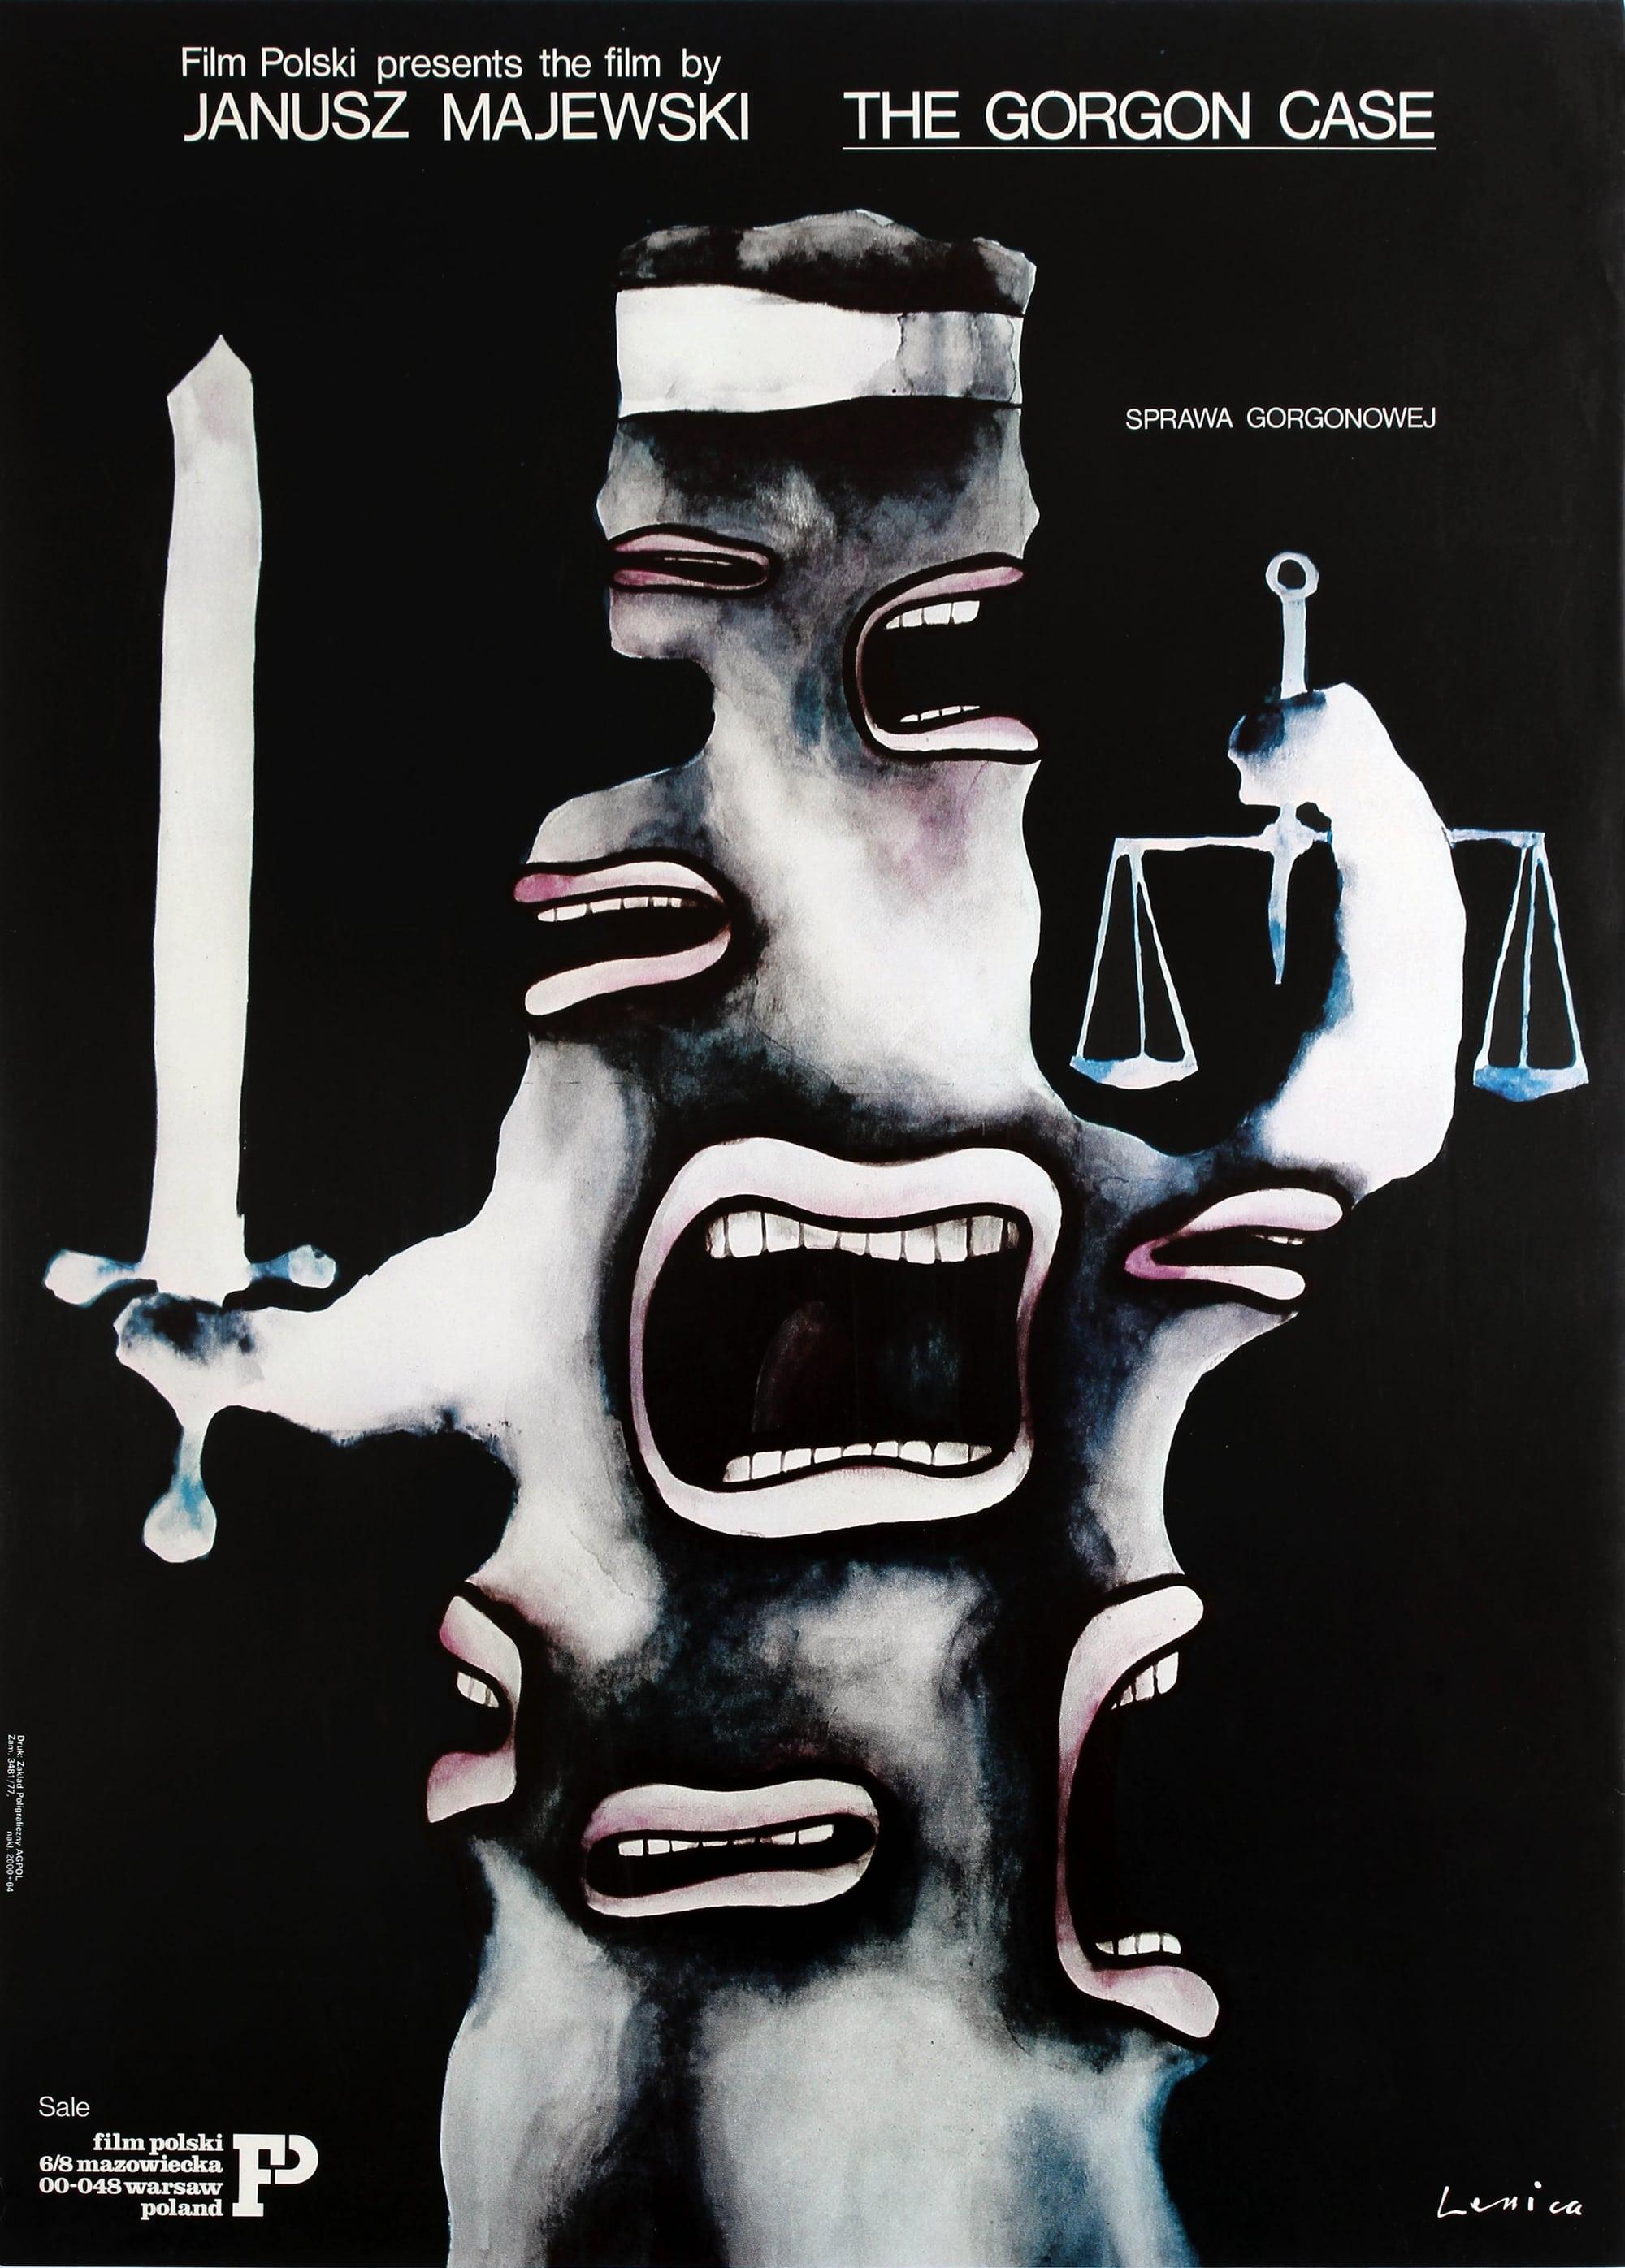 The Gorgon Case